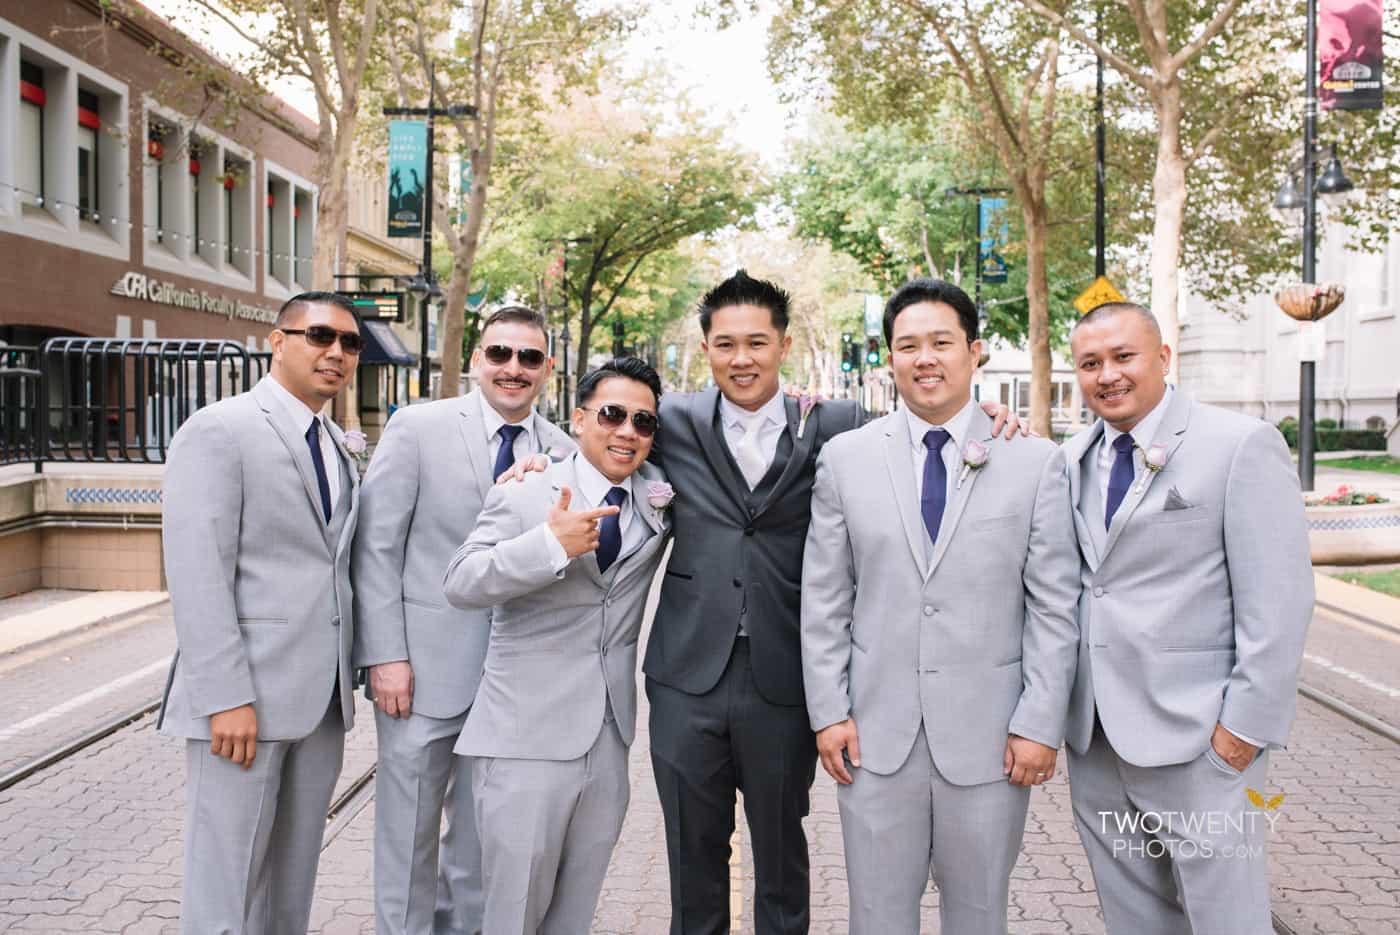 hyatt-regency-downtown-sacramento-wedding-photographer-32